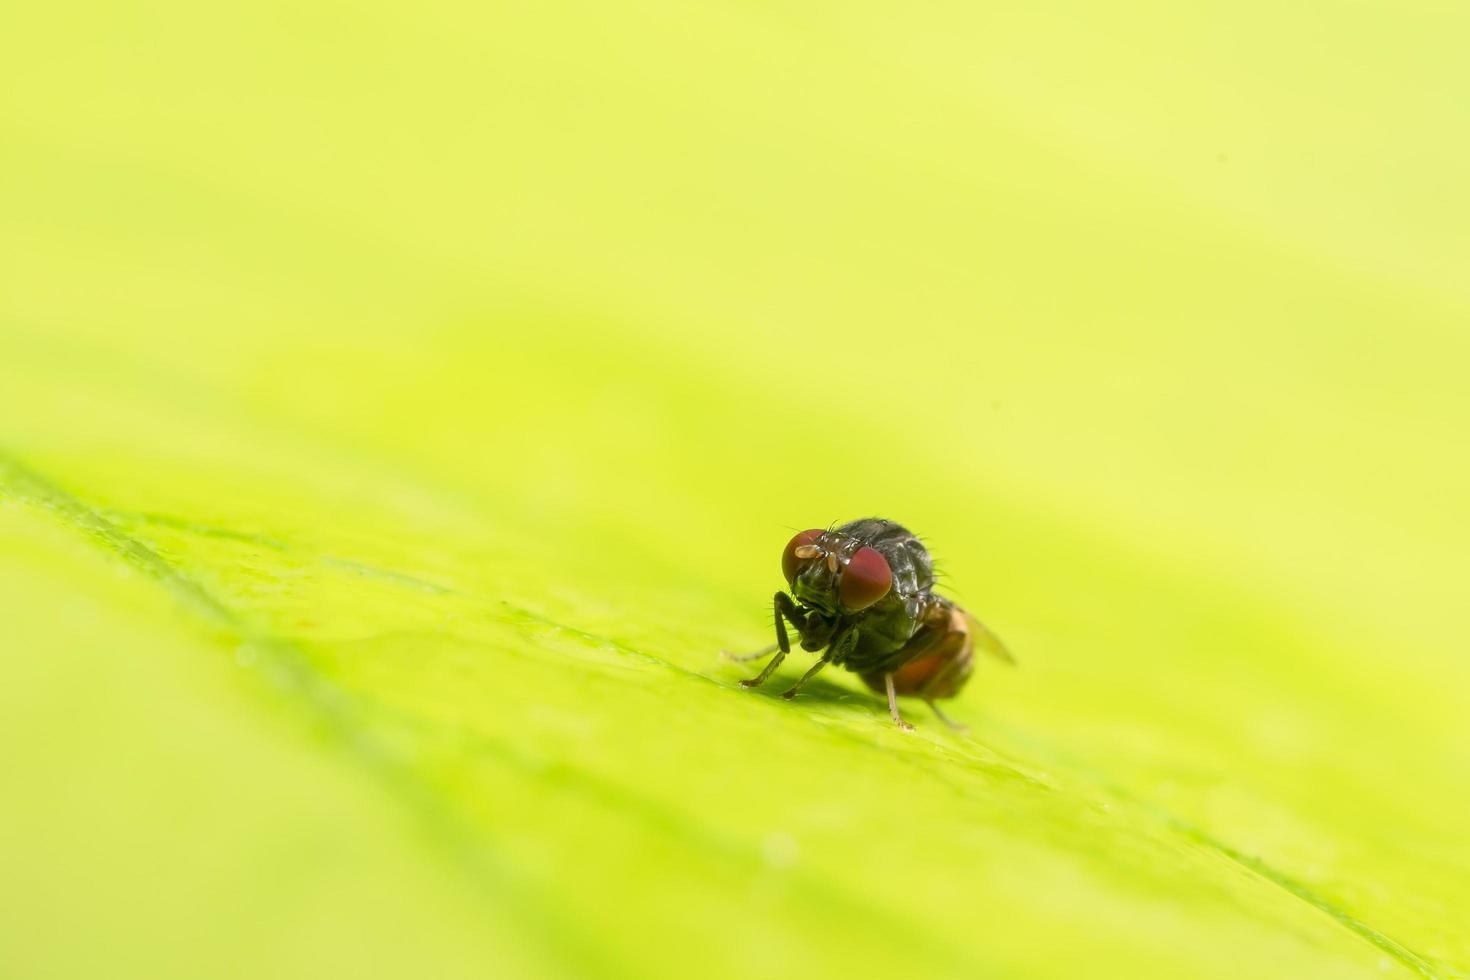 Nahaufnahme von Drosophila melanogaster auf Blatt foto